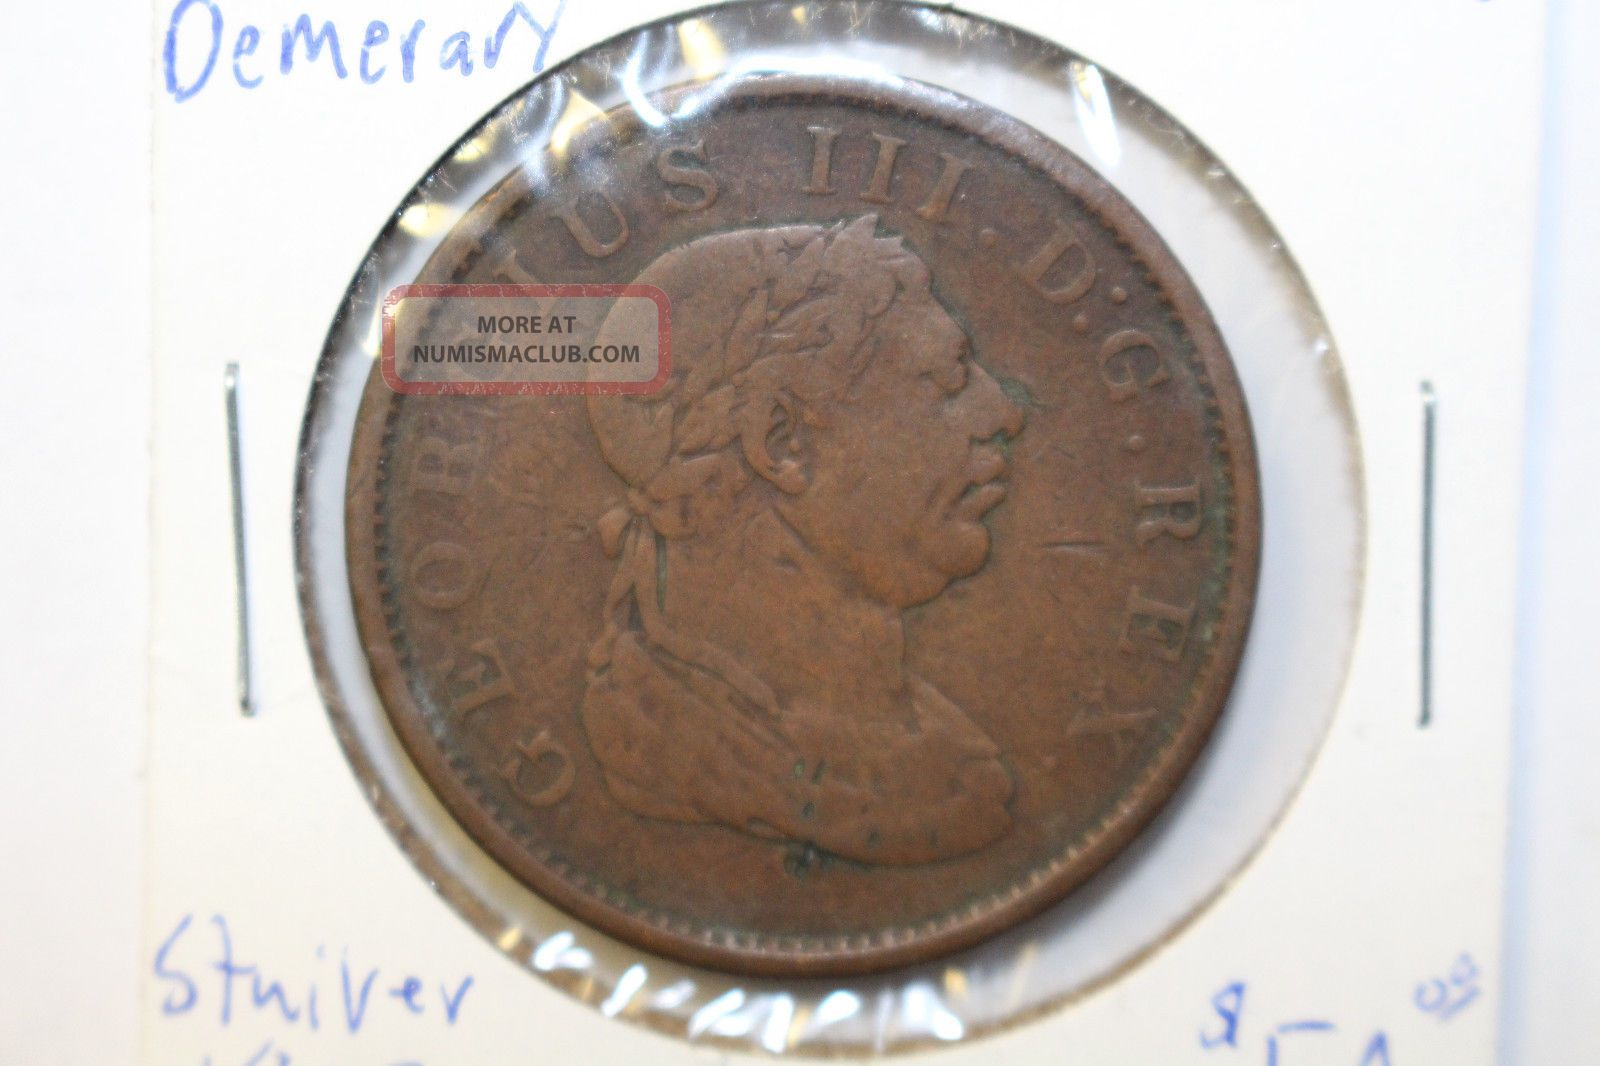 1813 Essequido & Demerary Stuiver Token Km 10 To Usa South America photo